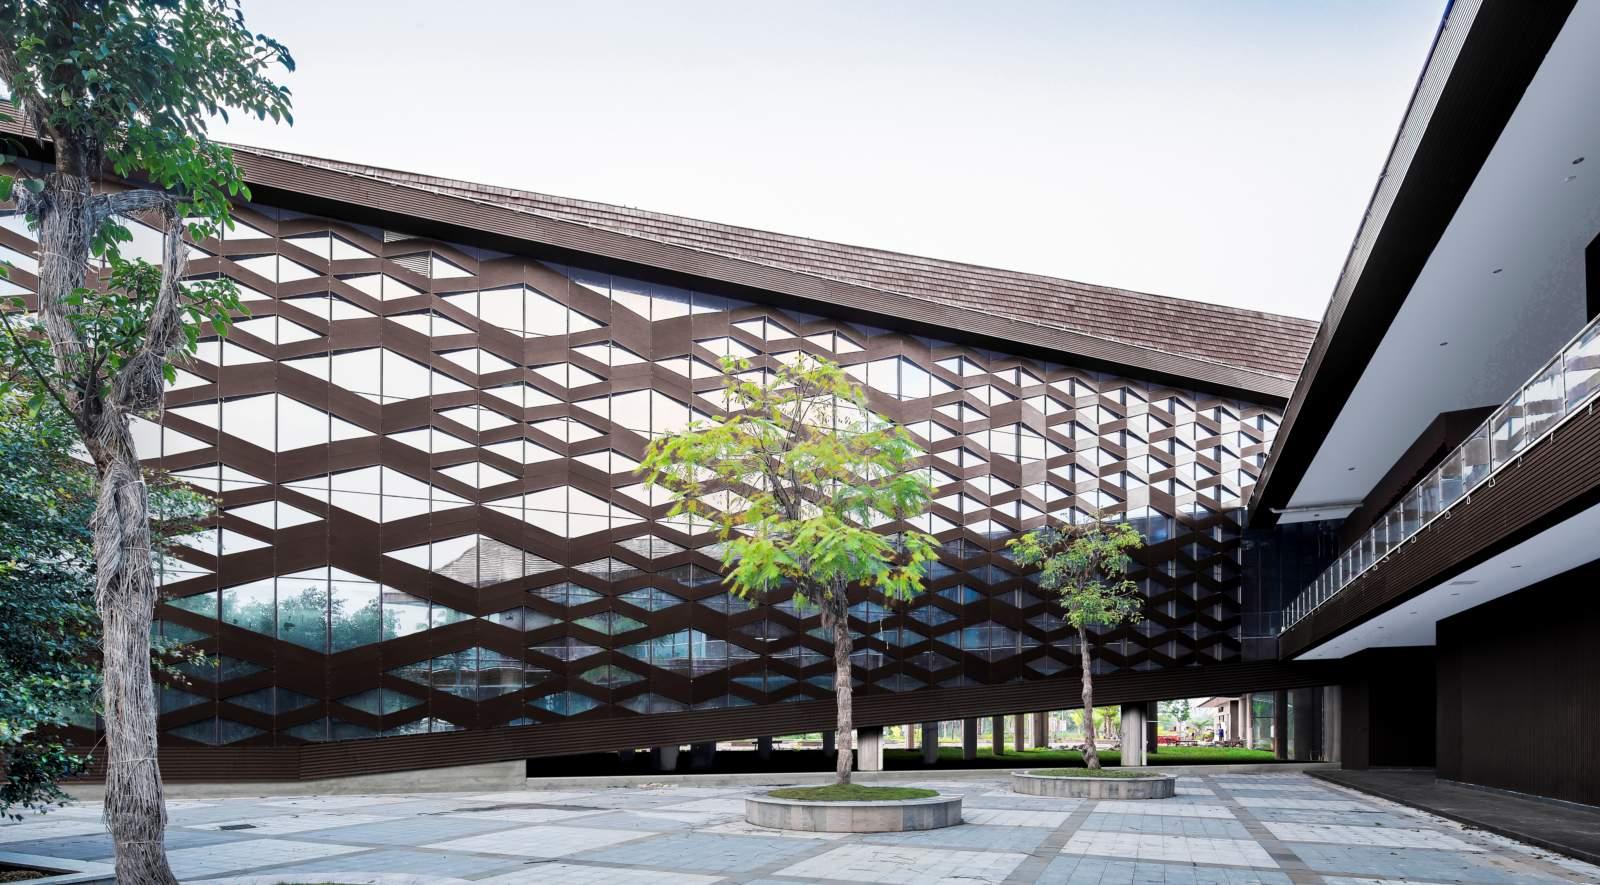 Xinglong Visitor Center